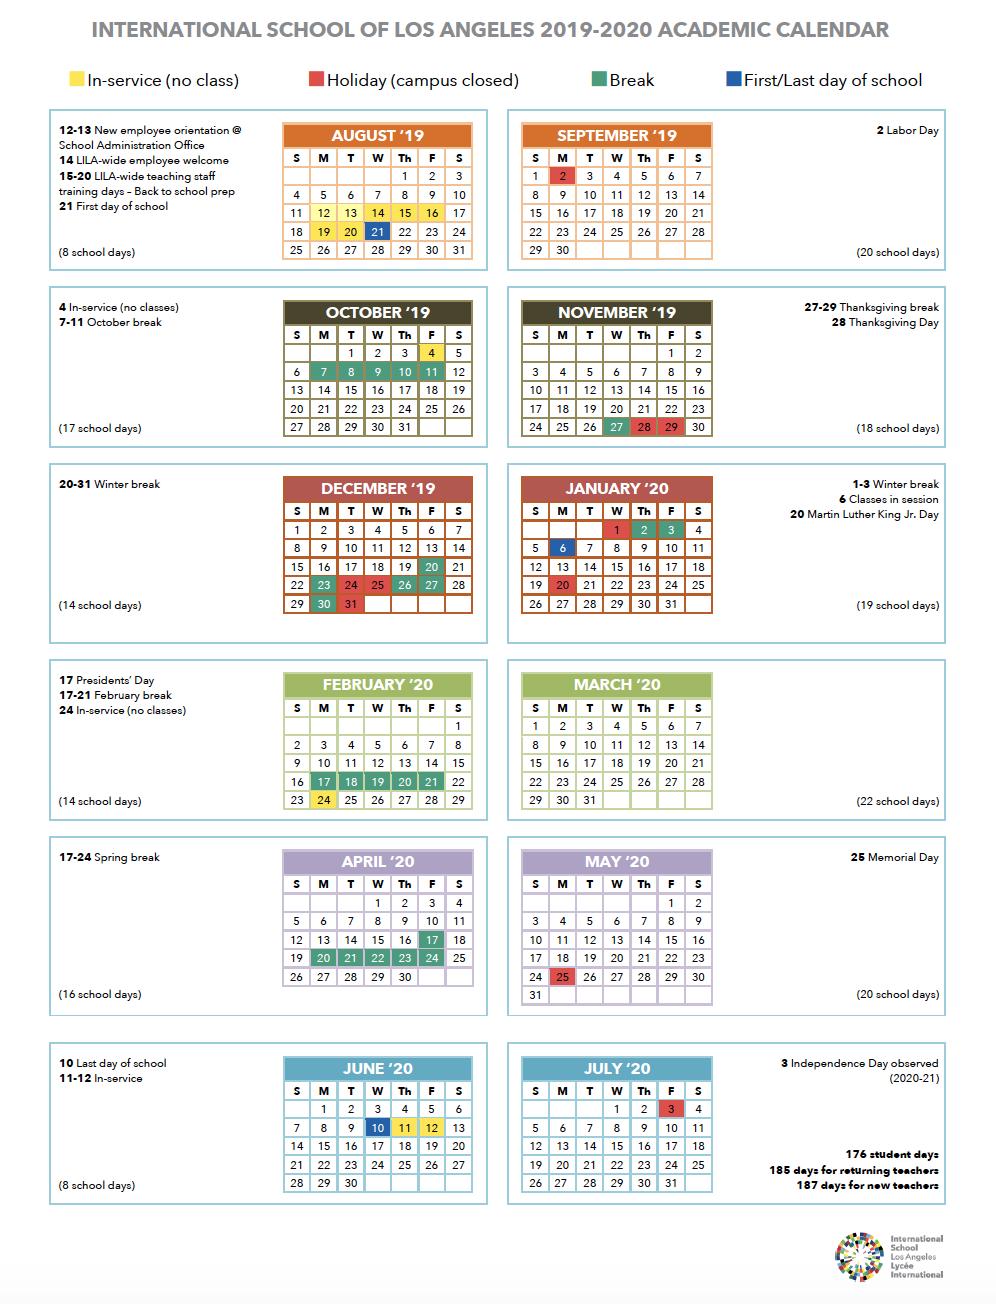 Calendar   International School Of Los Angeles Regarding Santa Monica College Academic Calendar